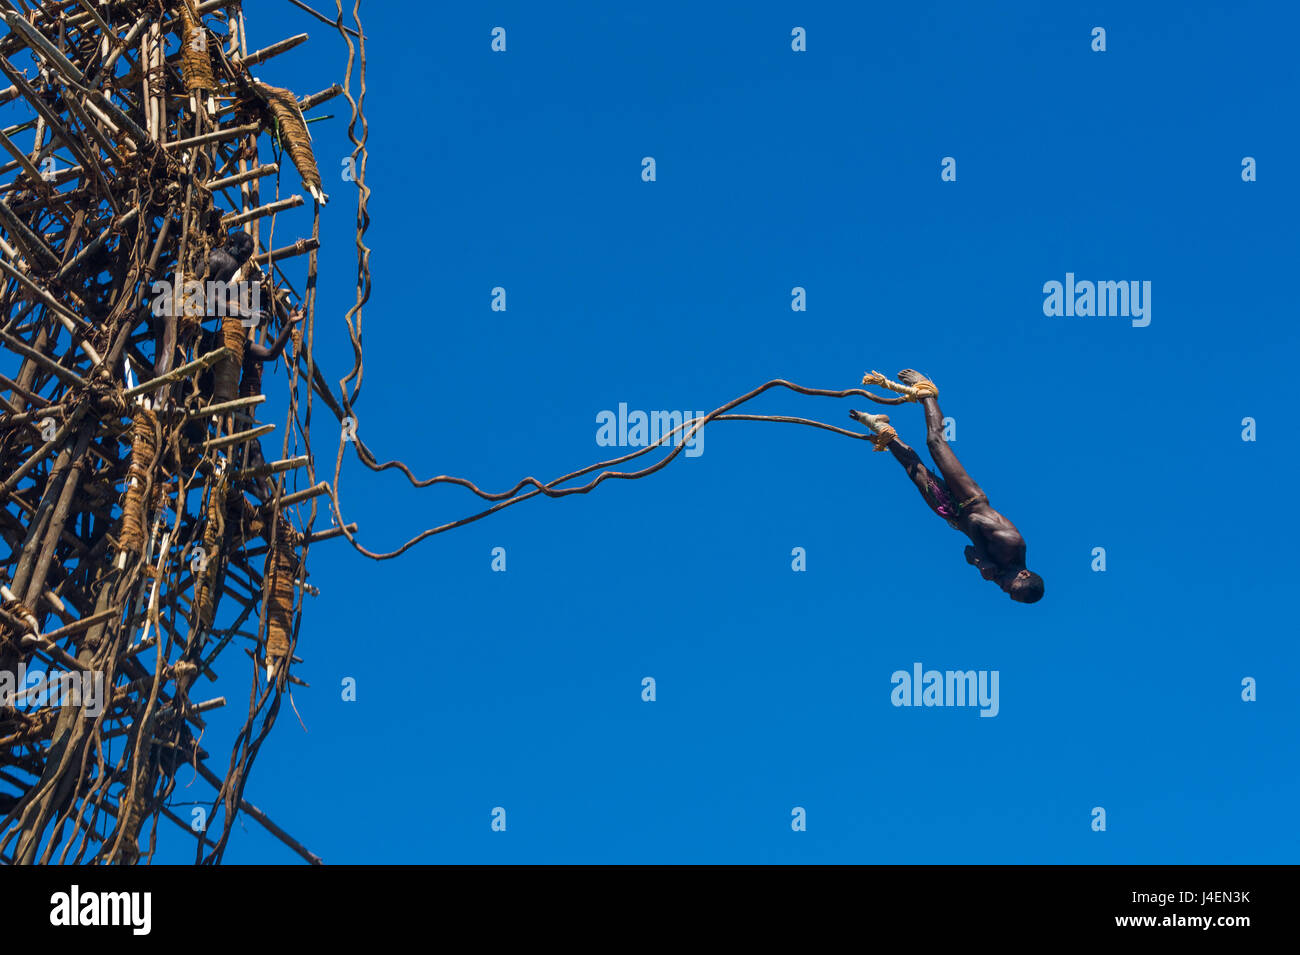 Man jumping from a bamboo tower, Pentecost land diving, Pentecost, Vanuatu, Pacific - Stock Image